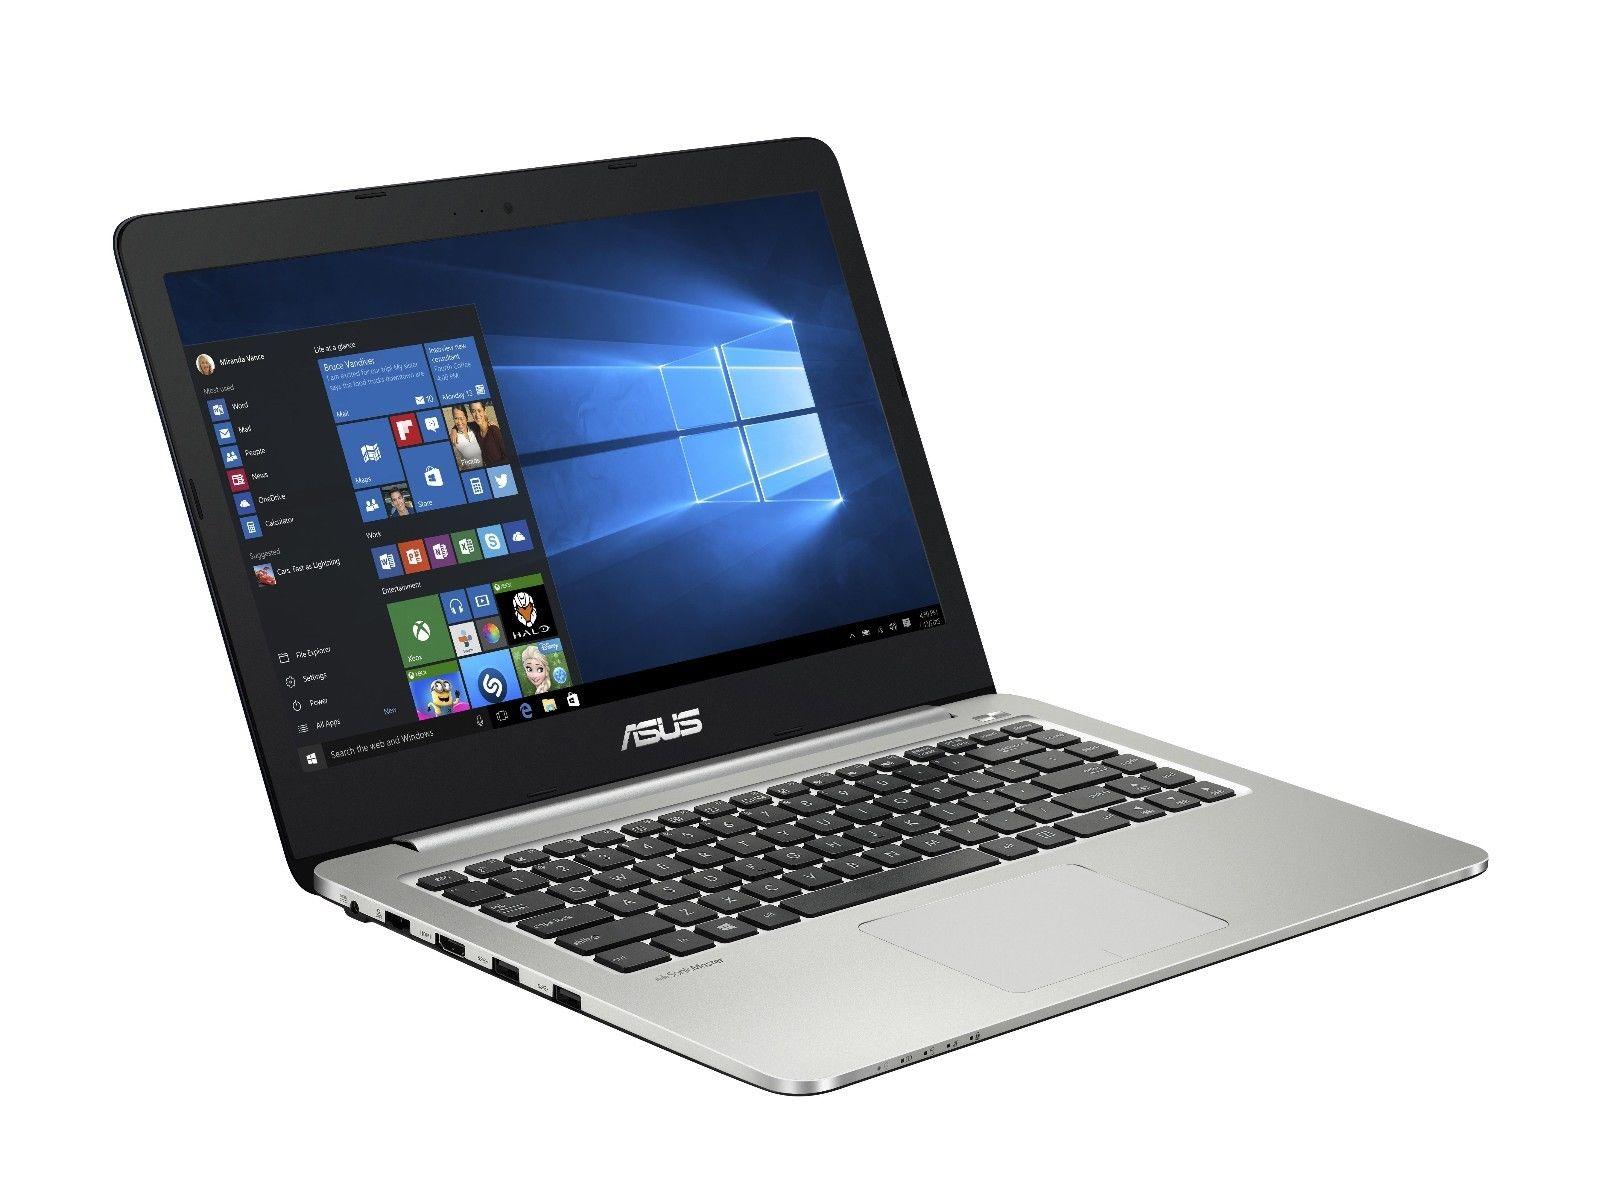 "ASUS Ultra Slim K401 Laptop: i7-5500U, 14"" 1080p LED, 8GB DDR3, 750GB HDD  $570 + Free Shipping"